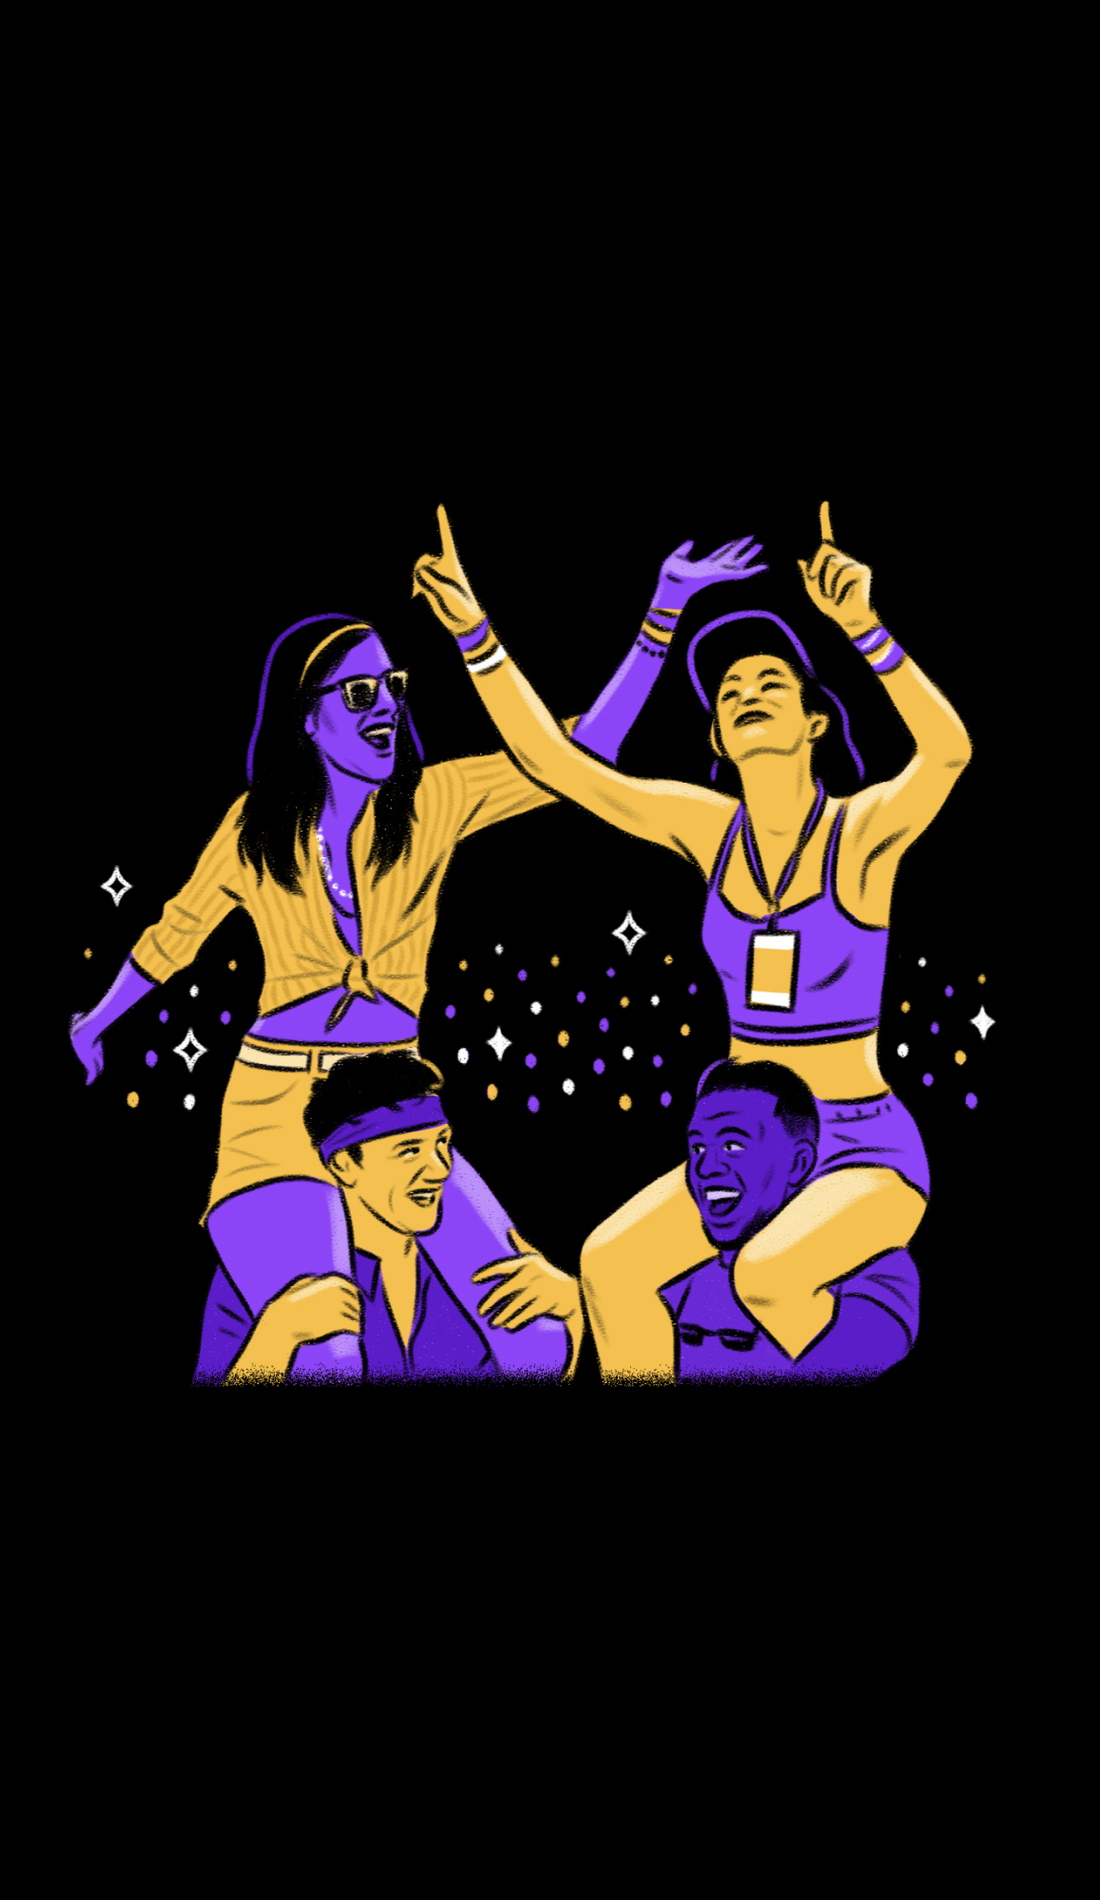 A Skyline Music Festival live event